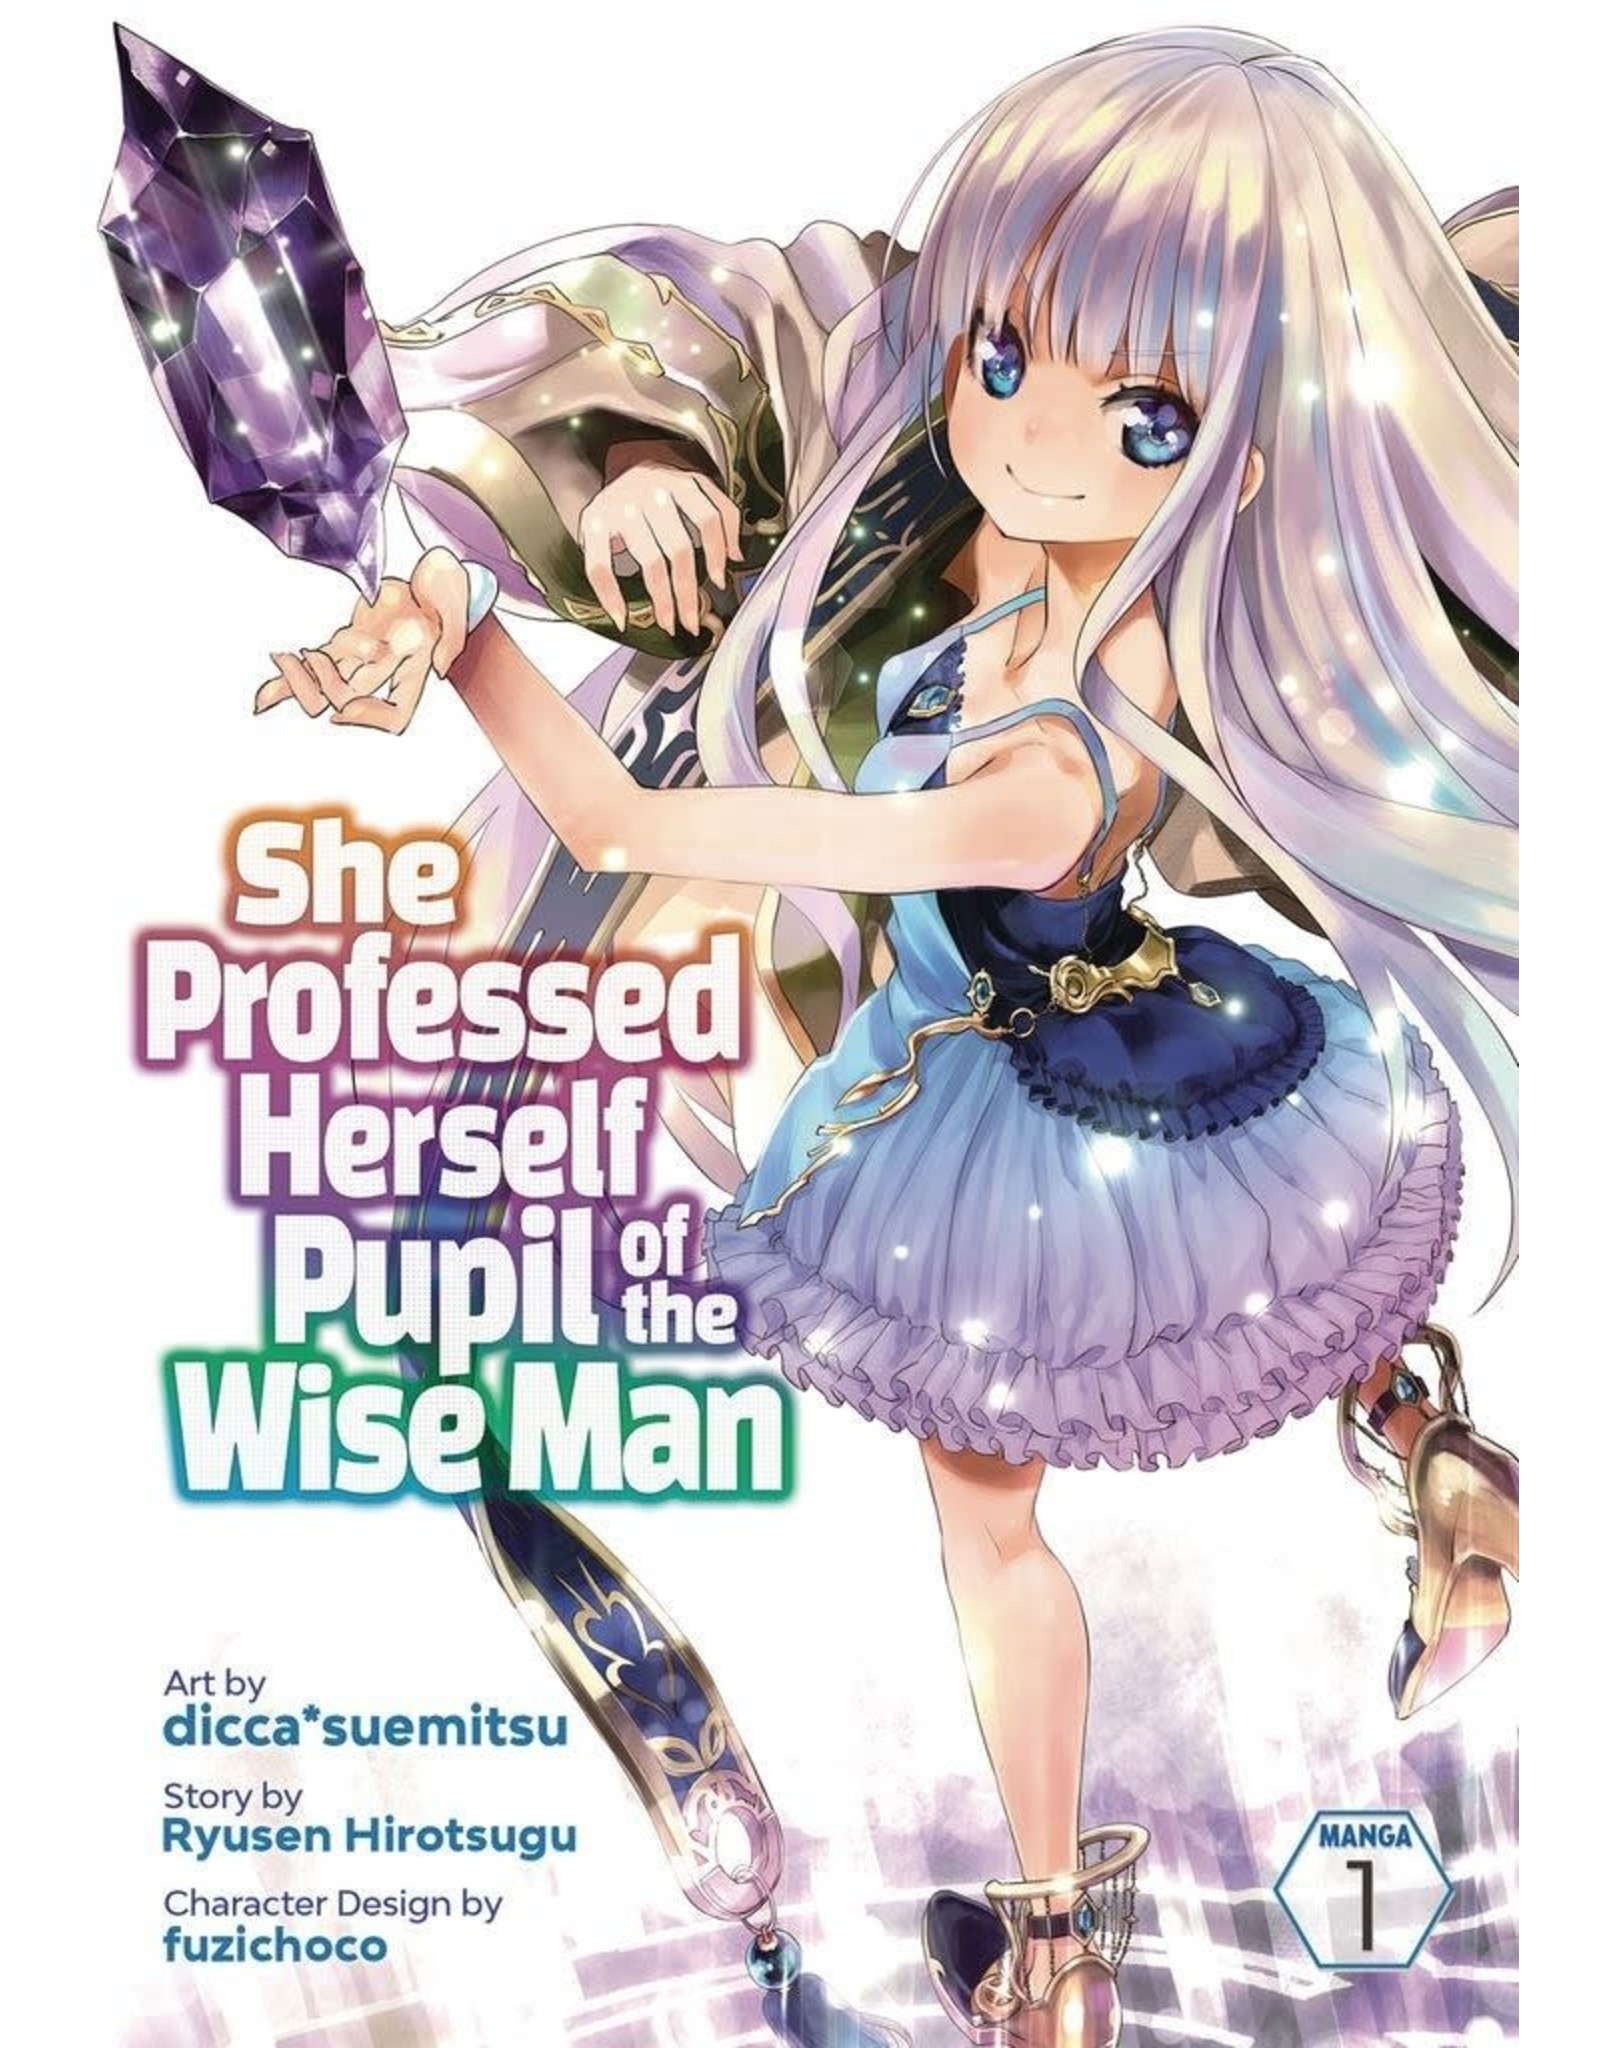 She Professed Herself Pupil Of The Wise Man (English) - Manga